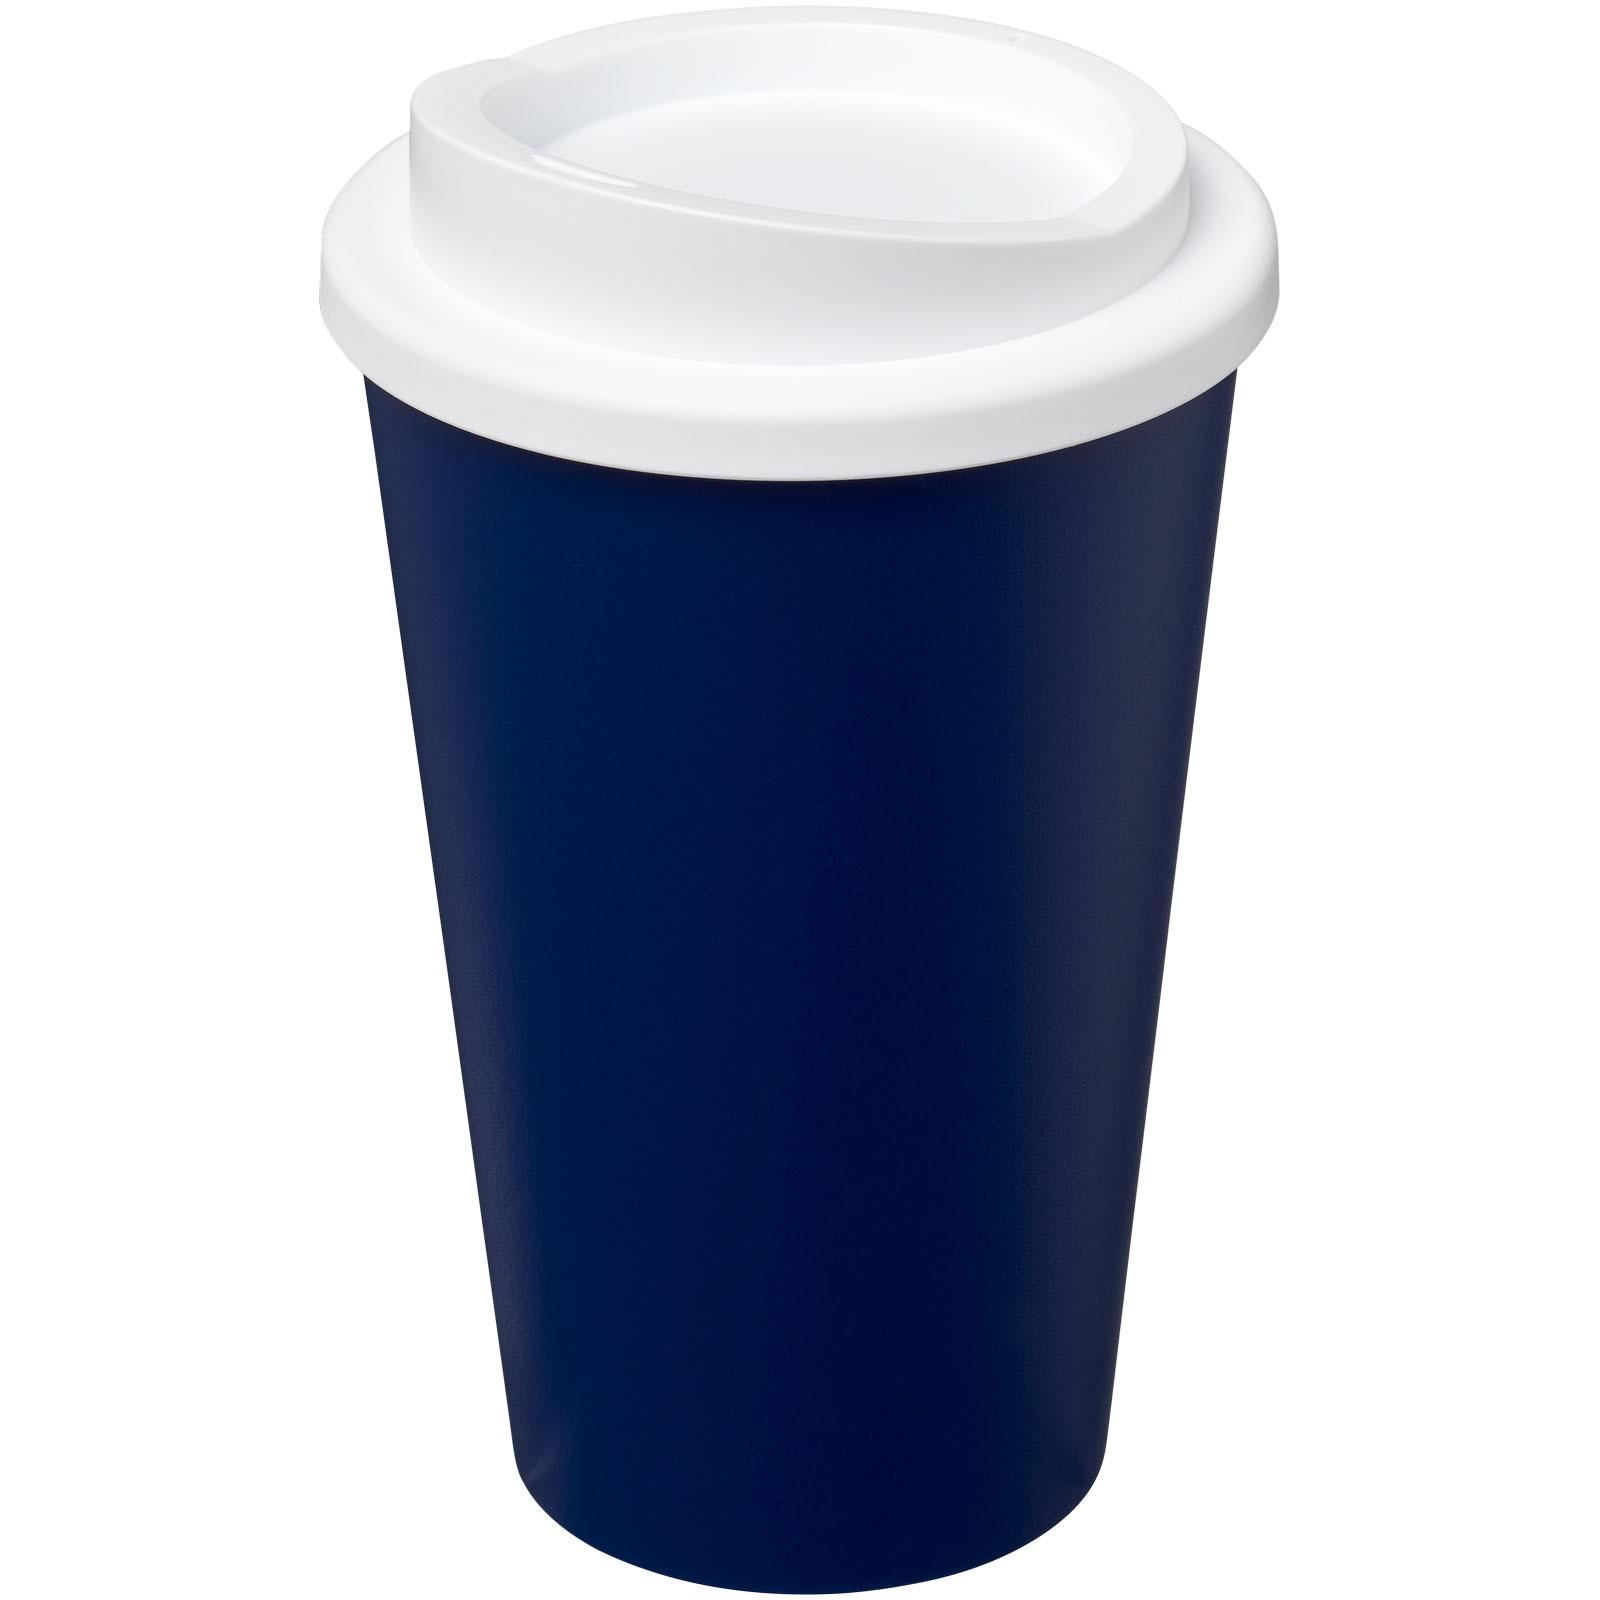 Americano® Vaso térmico de 350 ml - Azul / Blanco